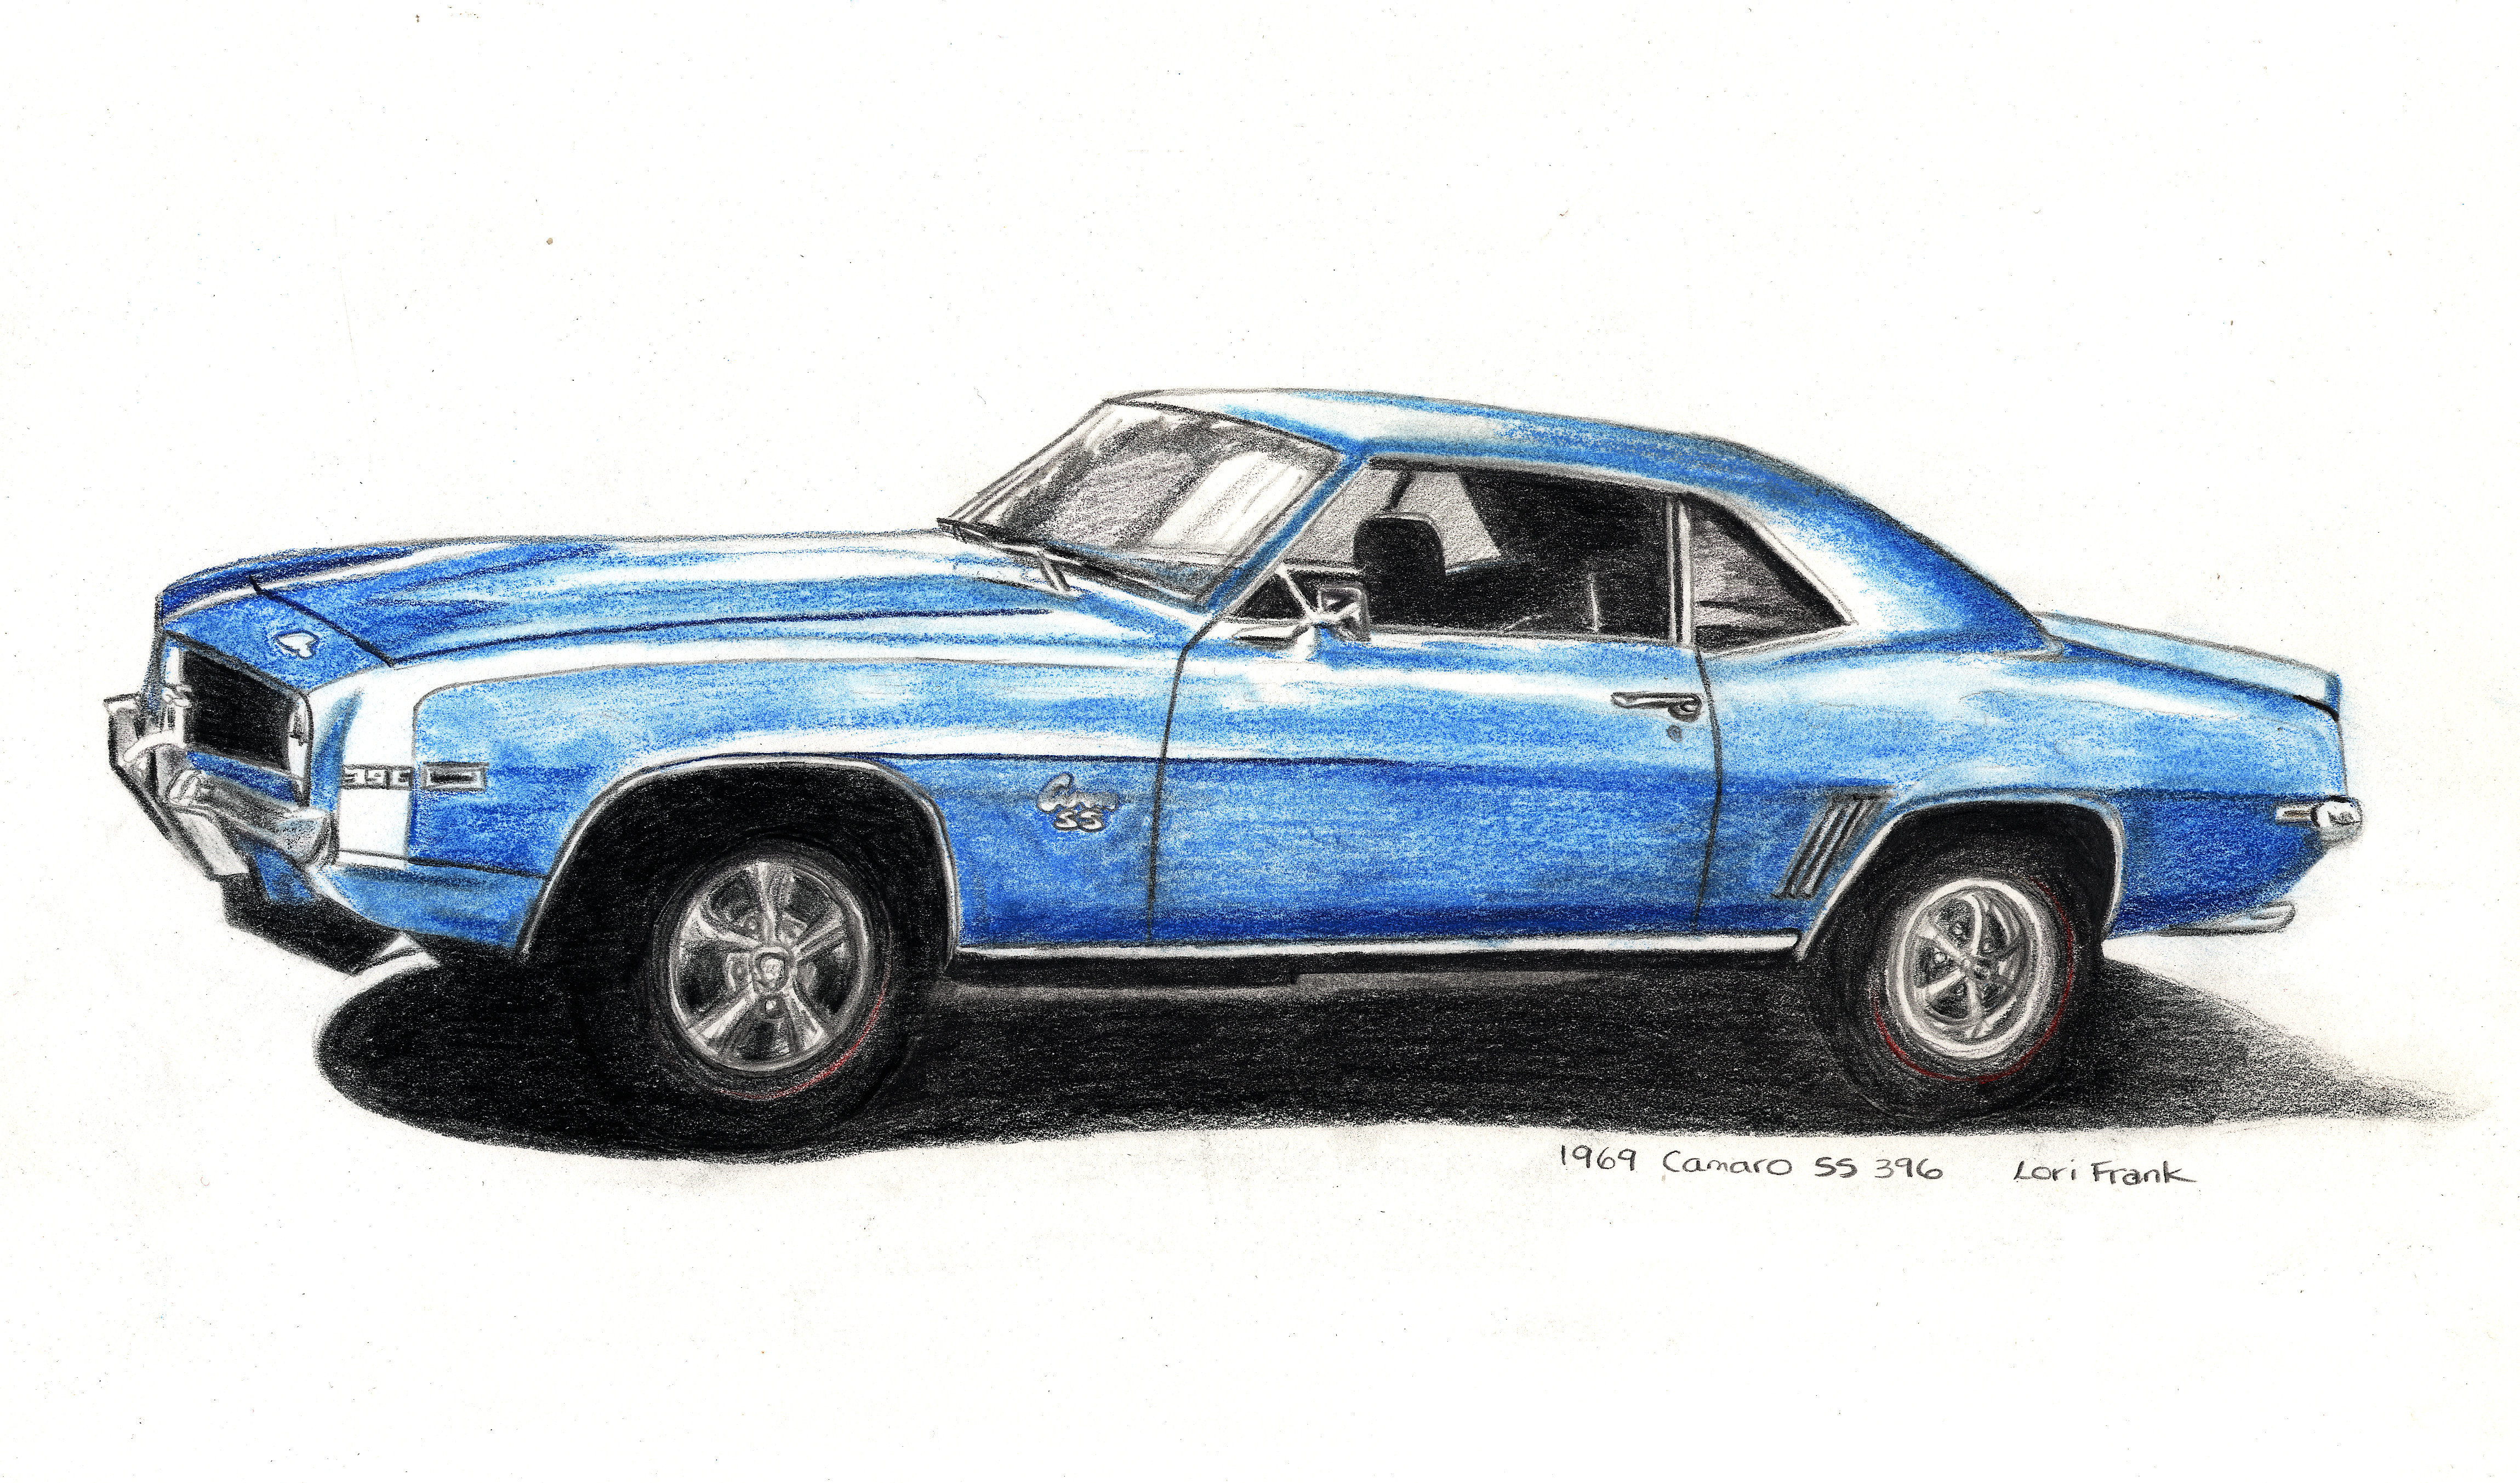 Lori Frank, Edmonton Artist | 1969 Camaro SS, Lori Frank ...